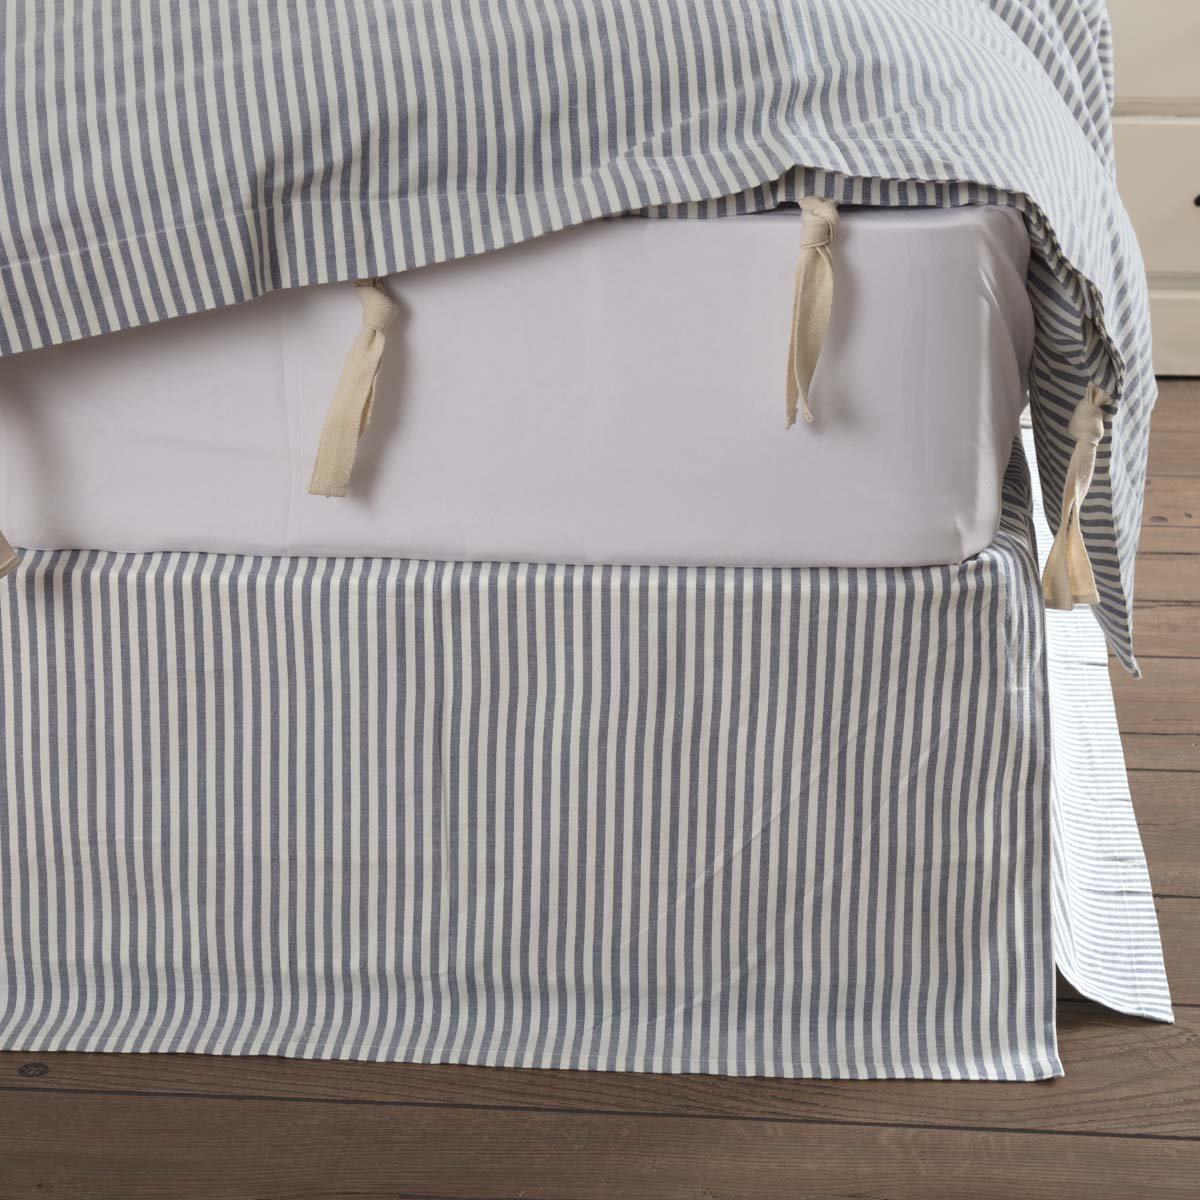 Sheets Pillowcases 60x80 W 16 Drop Tailored Dust Ruffle Piper Classics Farmhouse Ticking Stripe Blue Queen Bed Skirt Home Kitchen Ortopediasaojose Com Br